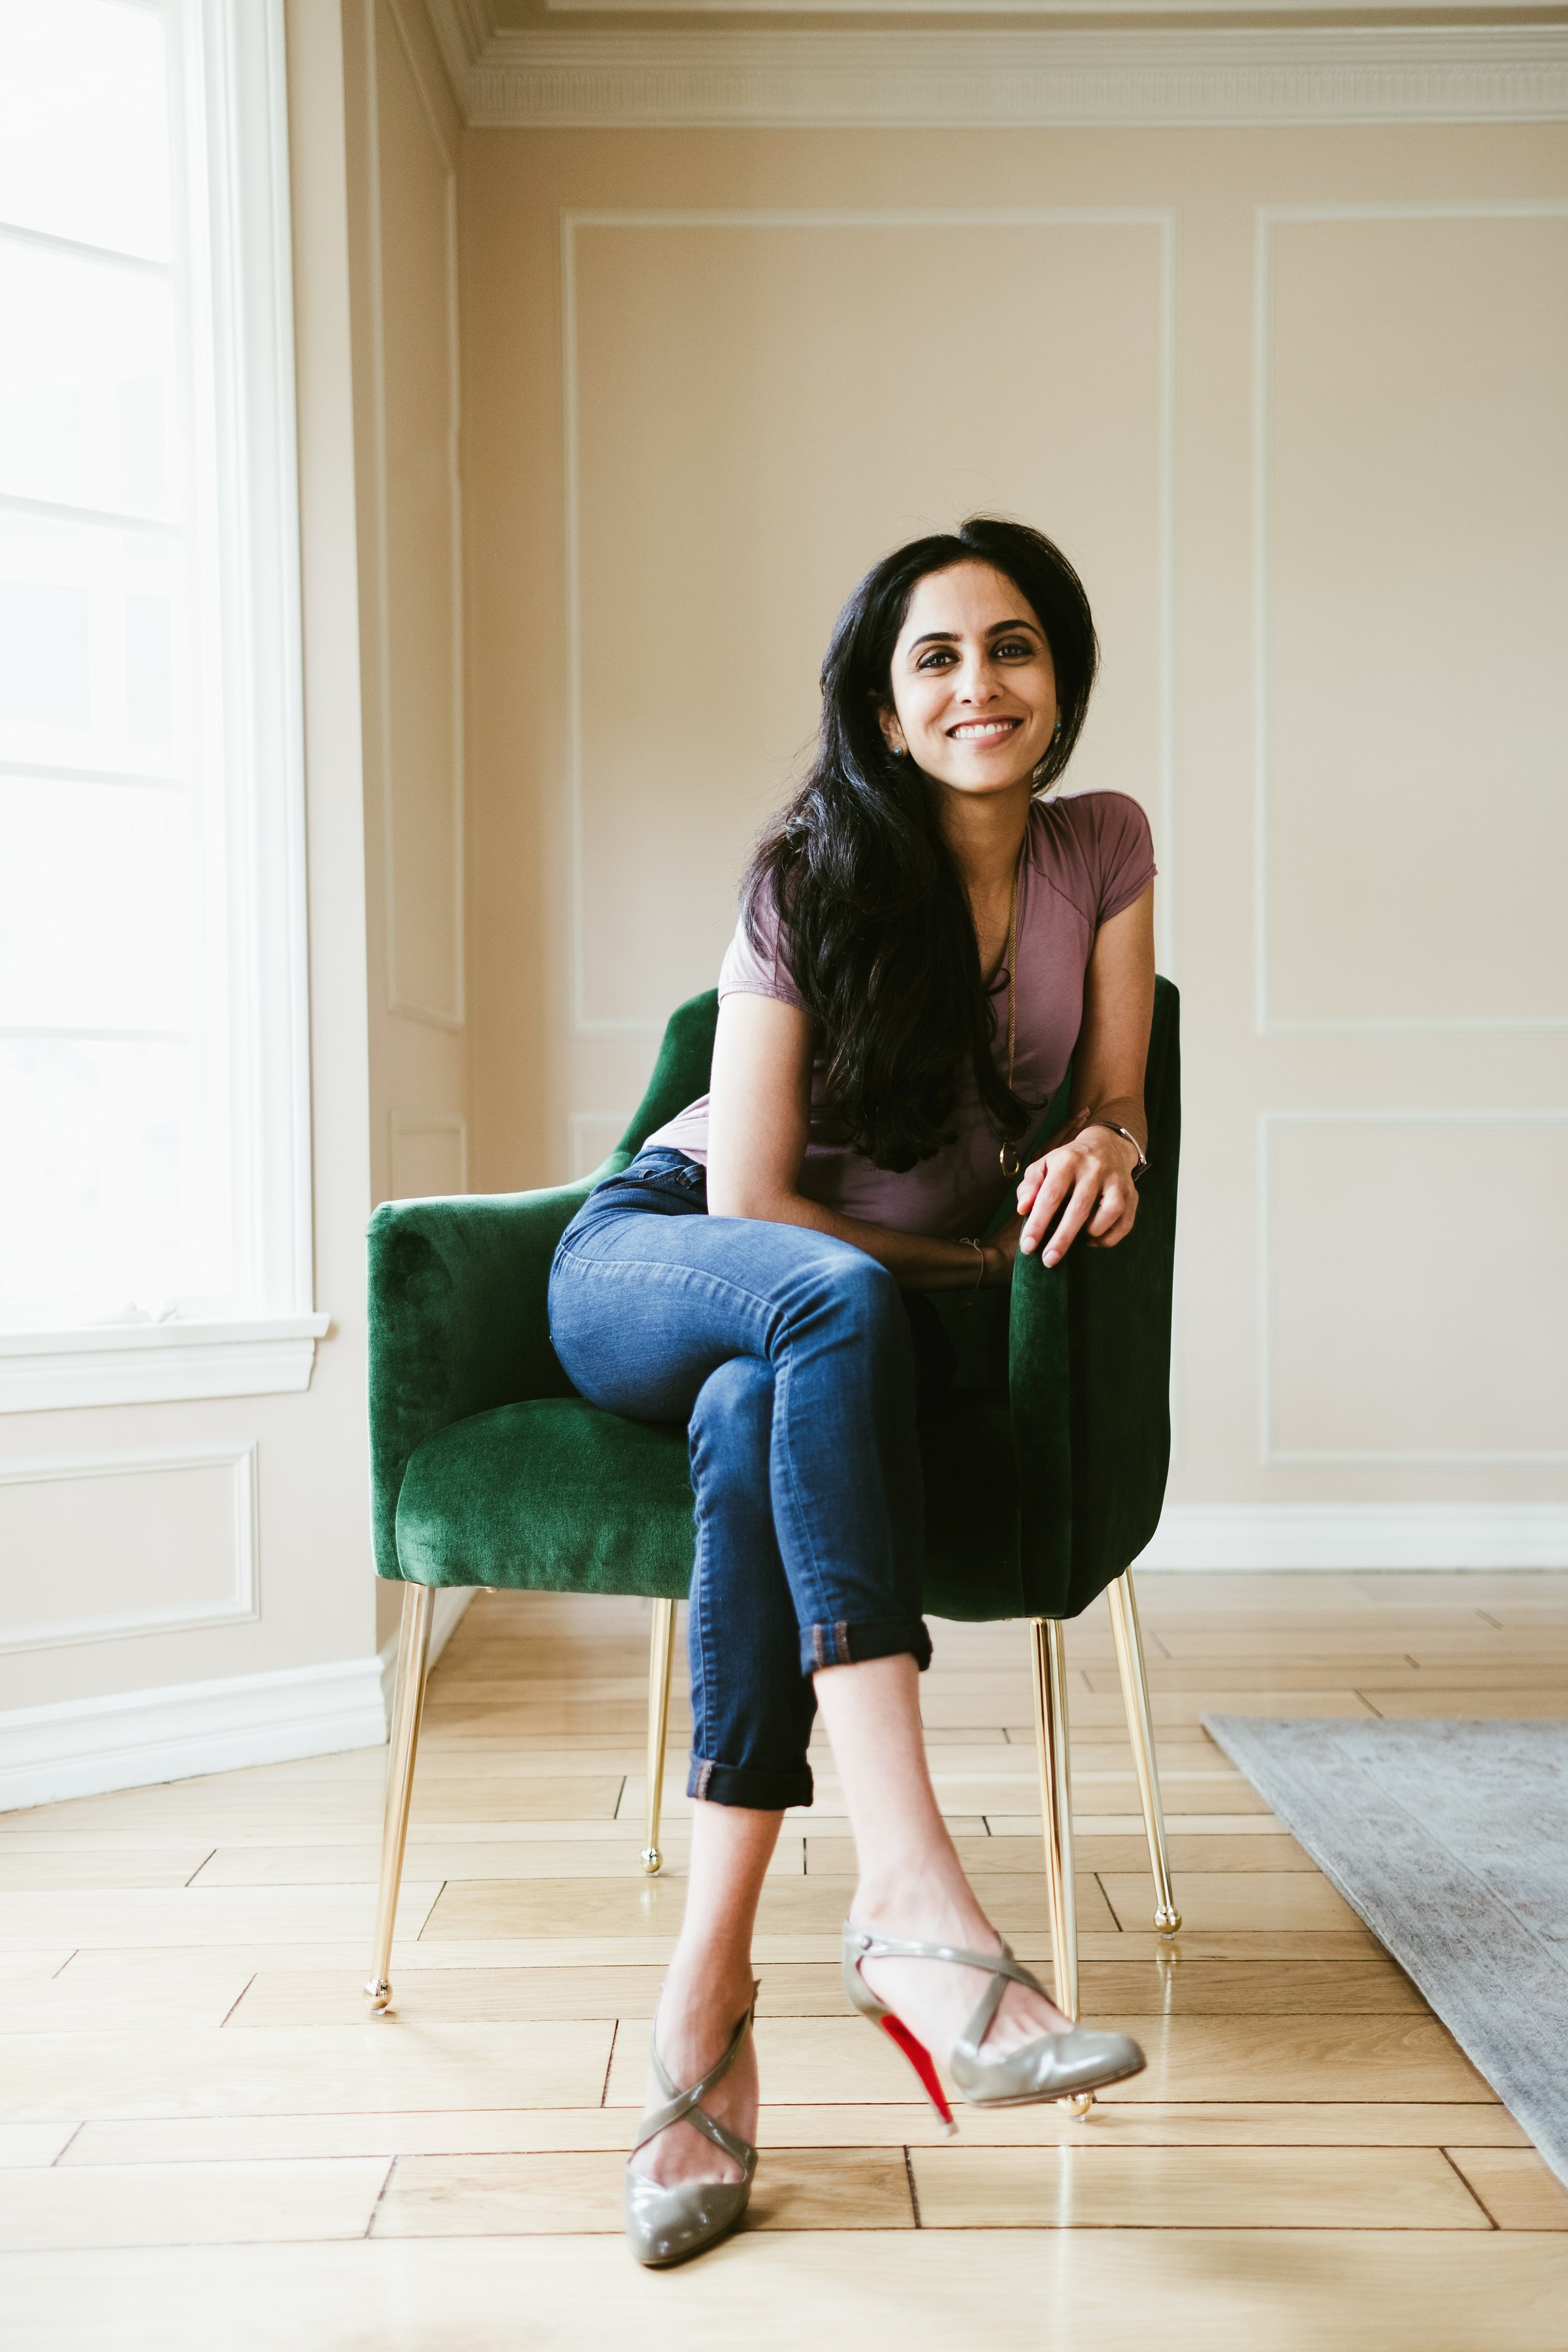 Ranavat Botanics Founder Michelle Ranavat